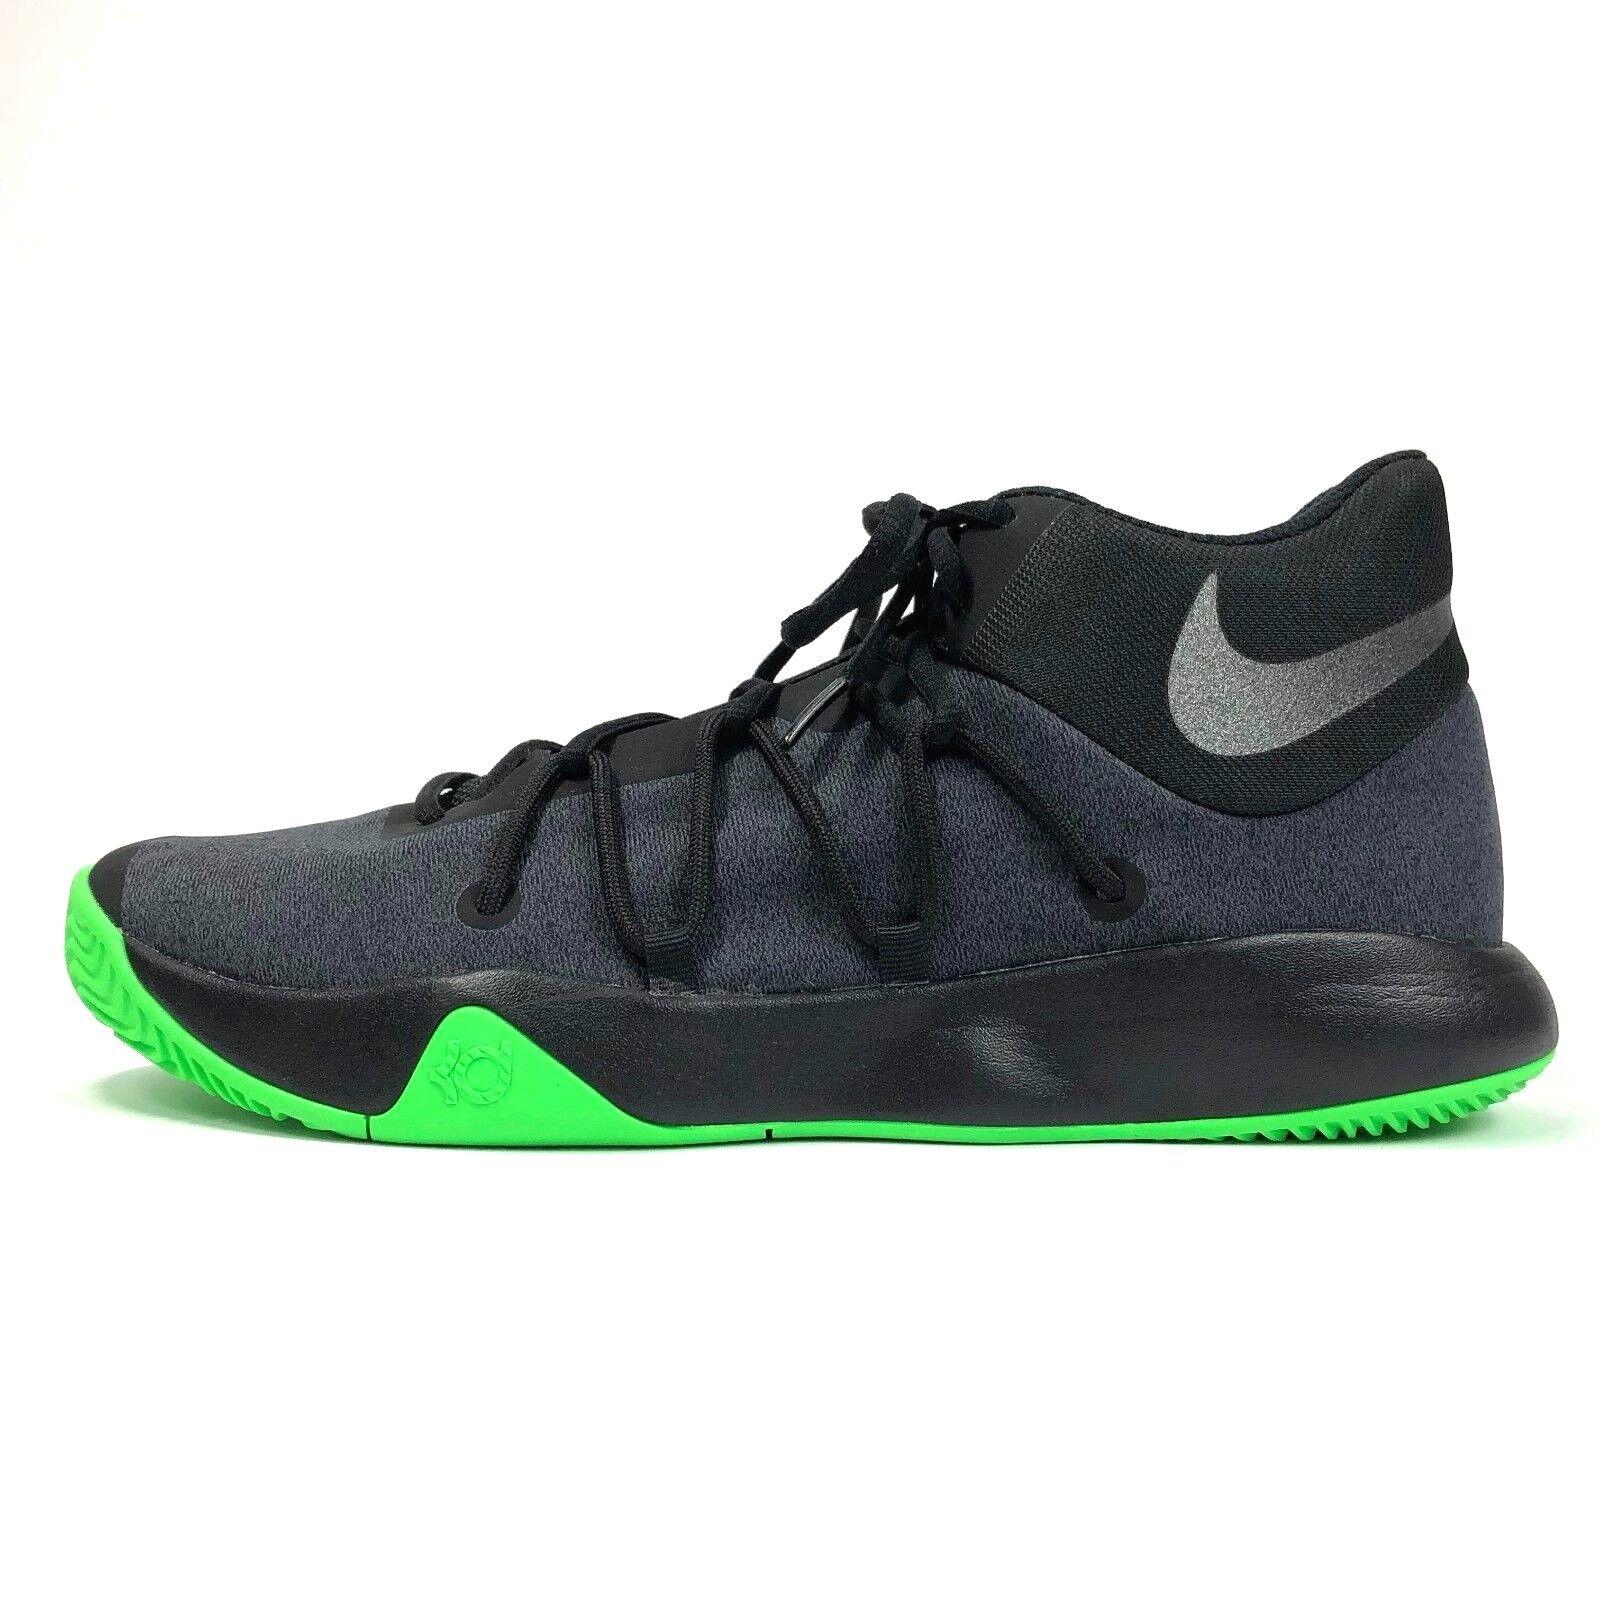 Nike KD Trey Trey KD 5 V Kevin Durant 897638 003 Black Rage Green Zoom Air Sz 10.5 NWOT 5b79eb